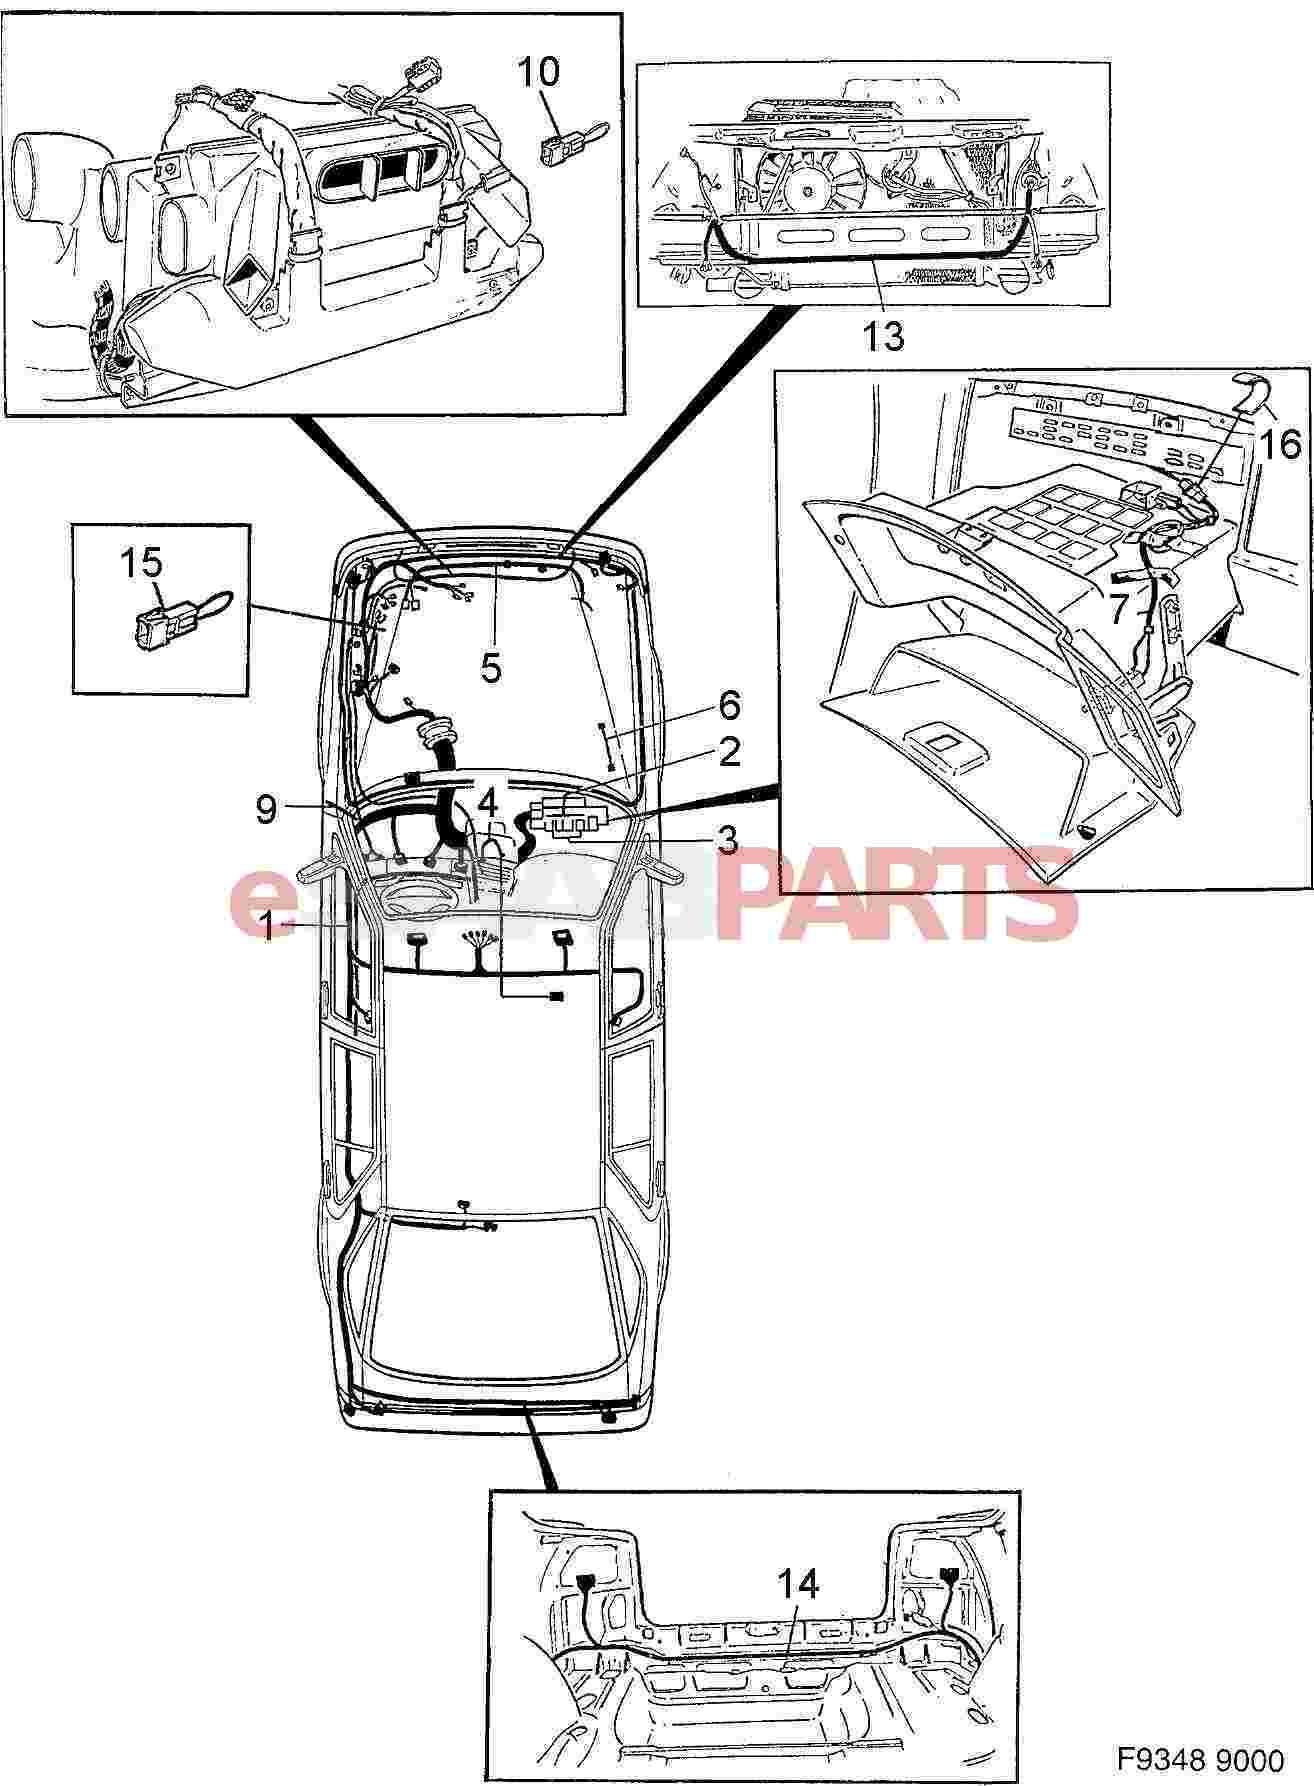 [DIAGRAM] 1989 91991 Saab 900electrical Wiring Diagram